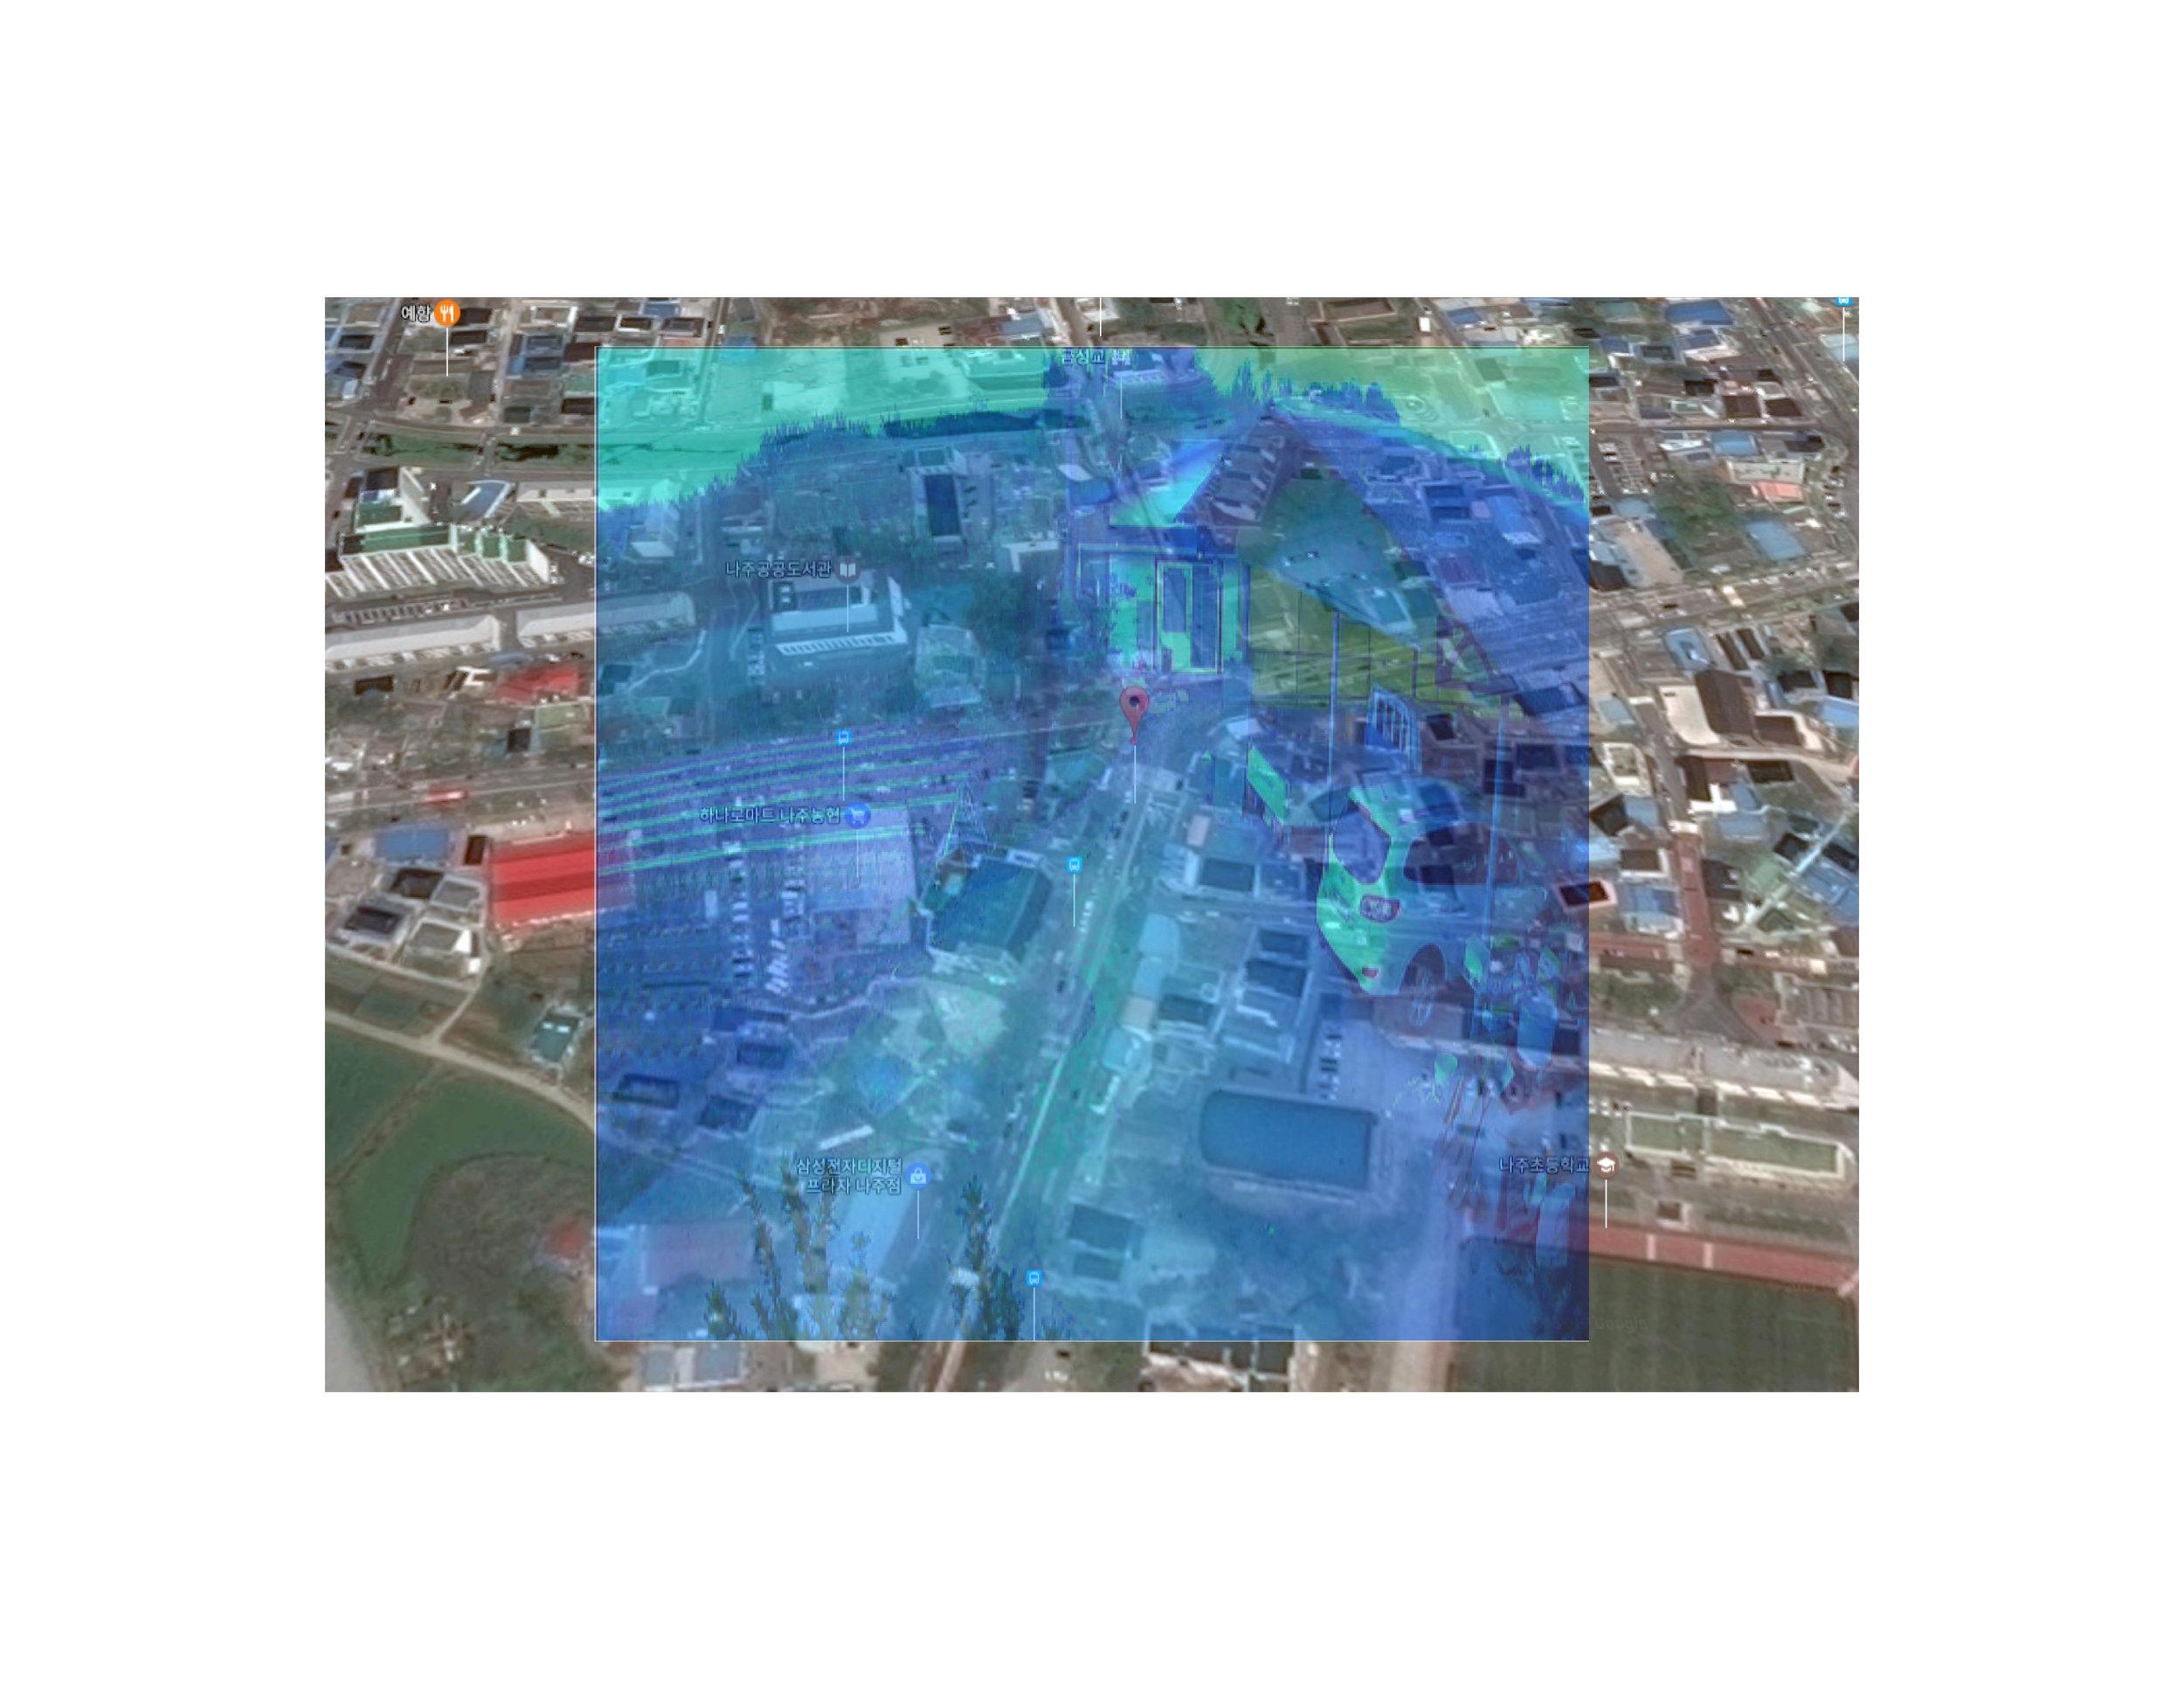 "Cholla, Namdo, South Korea Photo collage (Google Map locator, surveillance camera still) 16"" x 20"" 2017"